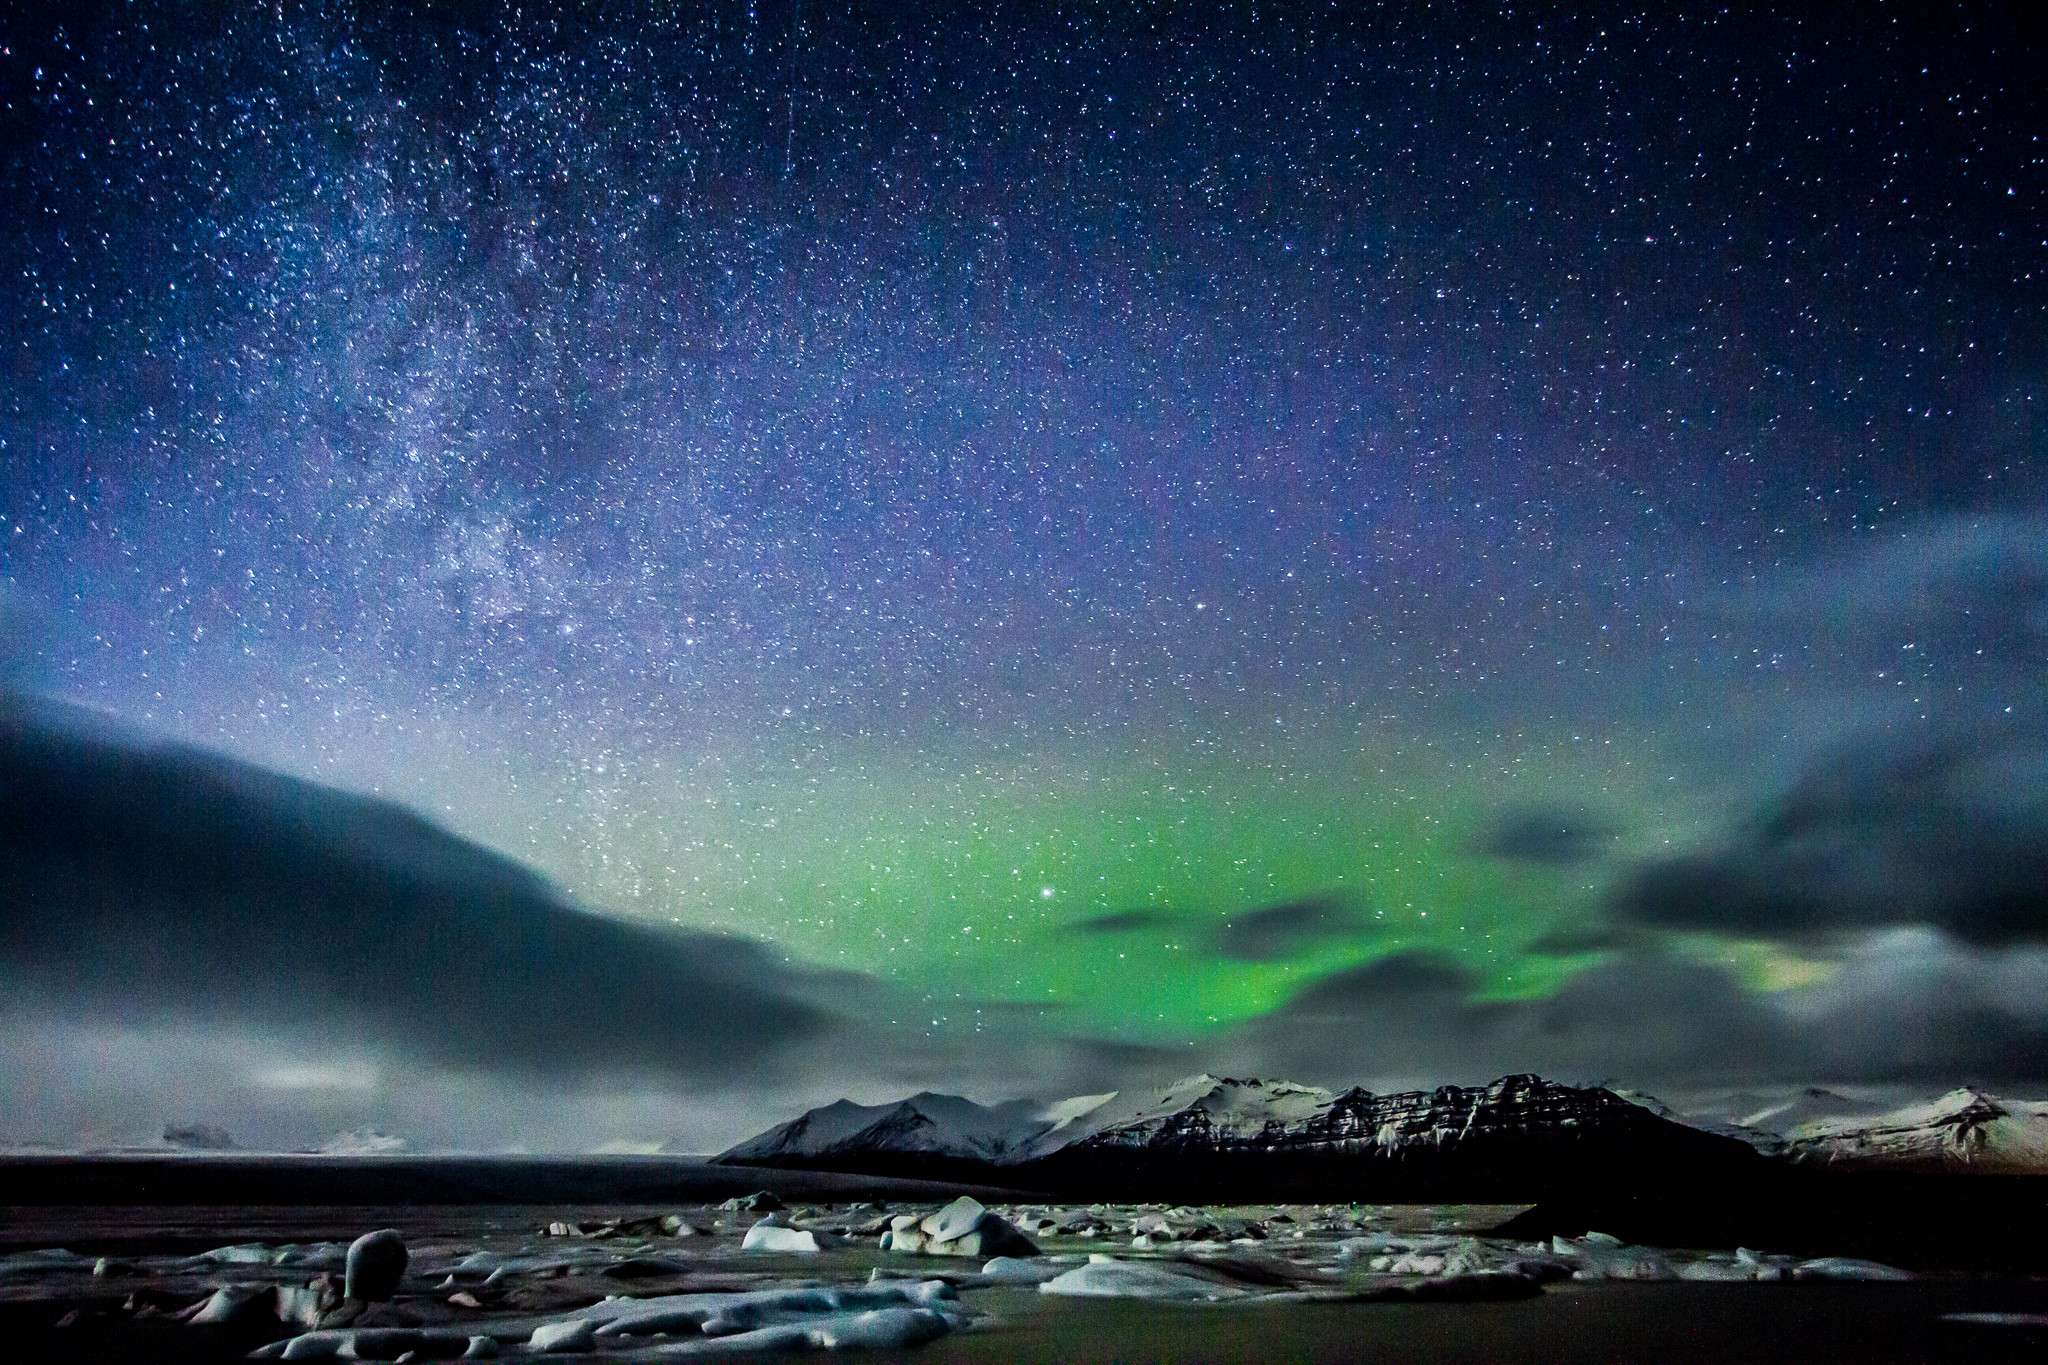 Mystical Northern Lights over Iceland